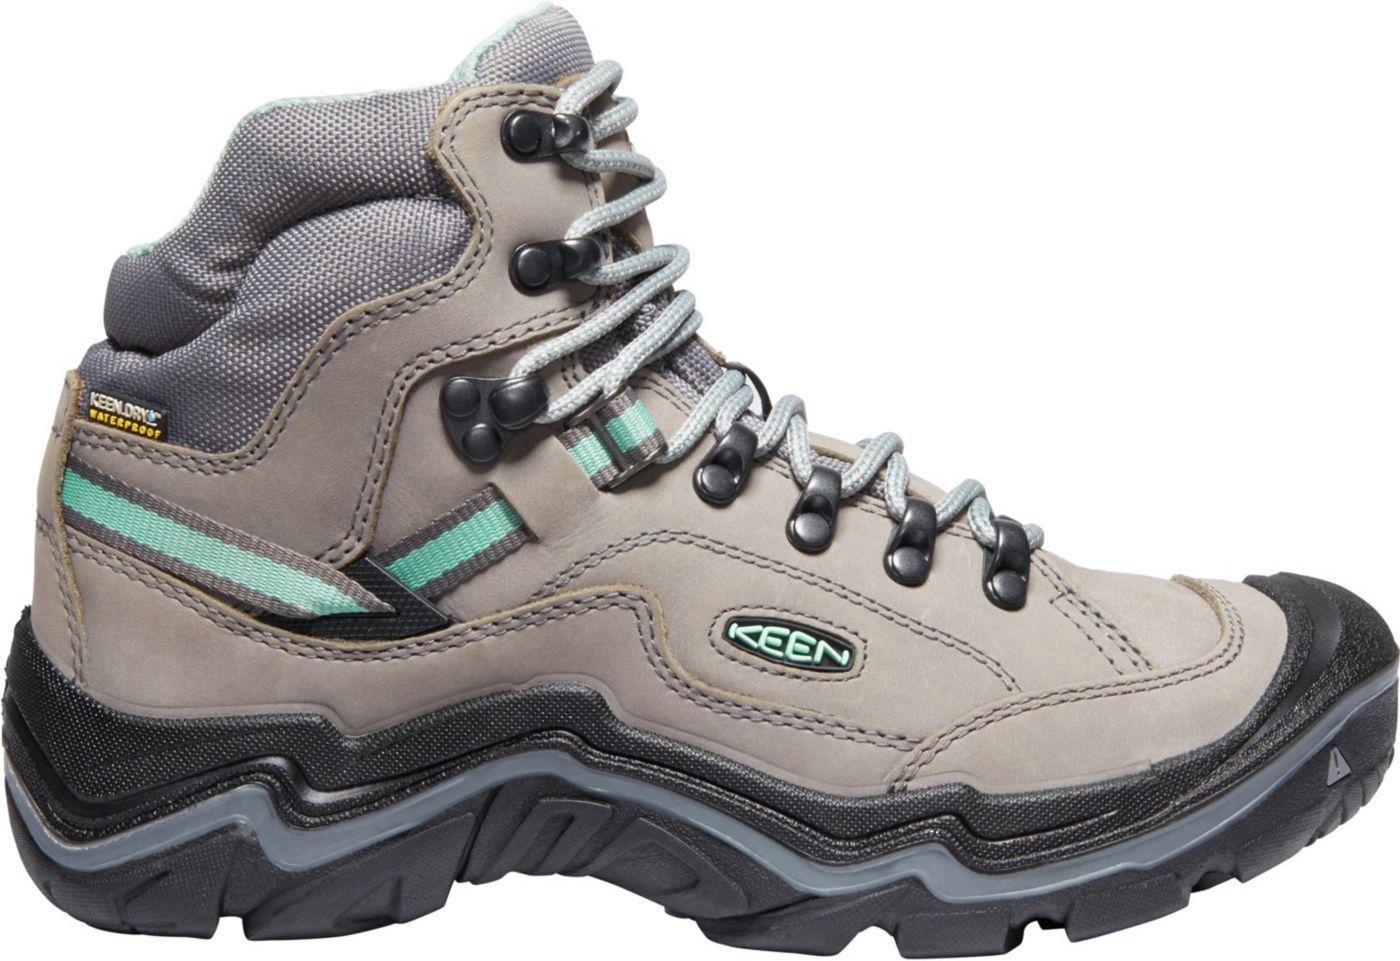 KEEN Women's Durand II Mid Waterproof Hiking Boots